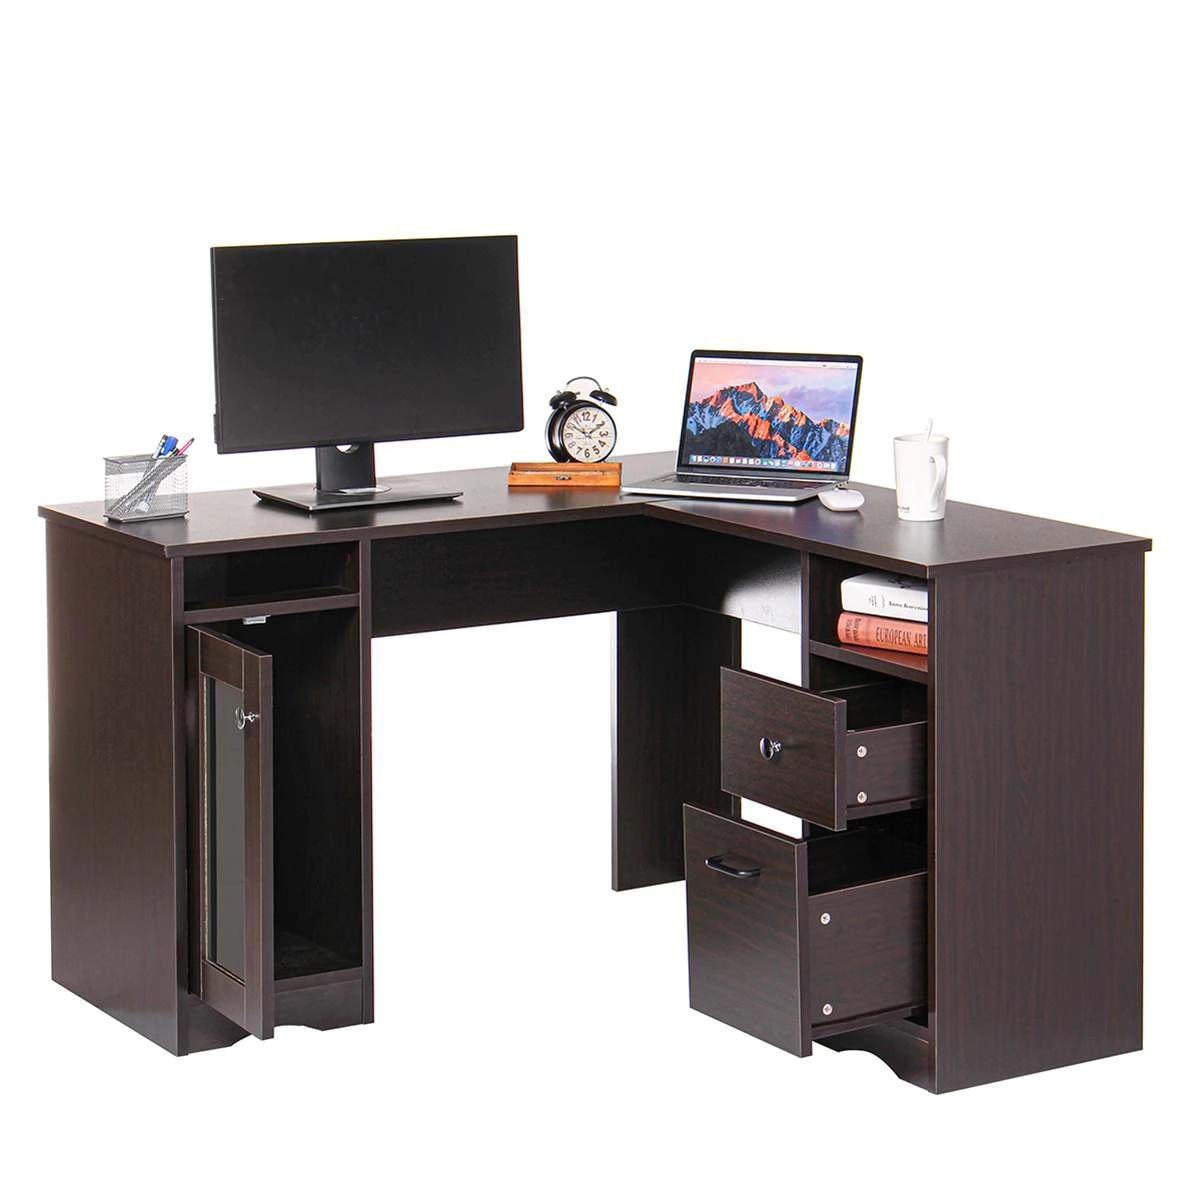 L Shaped Corner Computer Desk Large Capacity Laptop Stand Desktop Study Table Office Furniture Workstation Home Gaming Table Laptop Desks Aliexpress